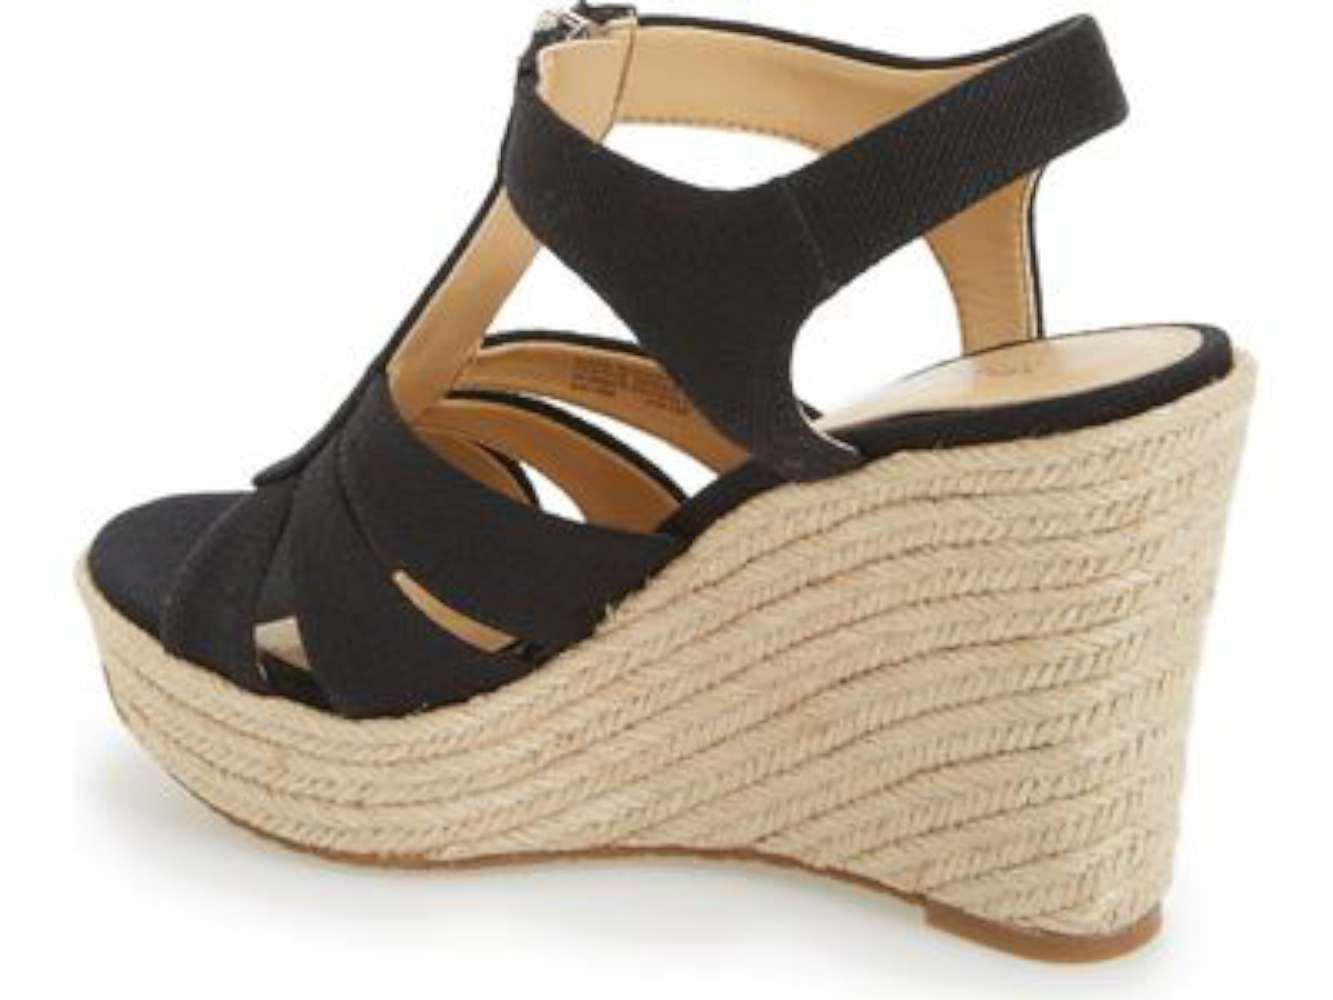 01db60232f01 Michael Kors - Black Womens Berkley Platform Wedge Open Toe Casual Platform  Sandals - Lyst. View fullscreen